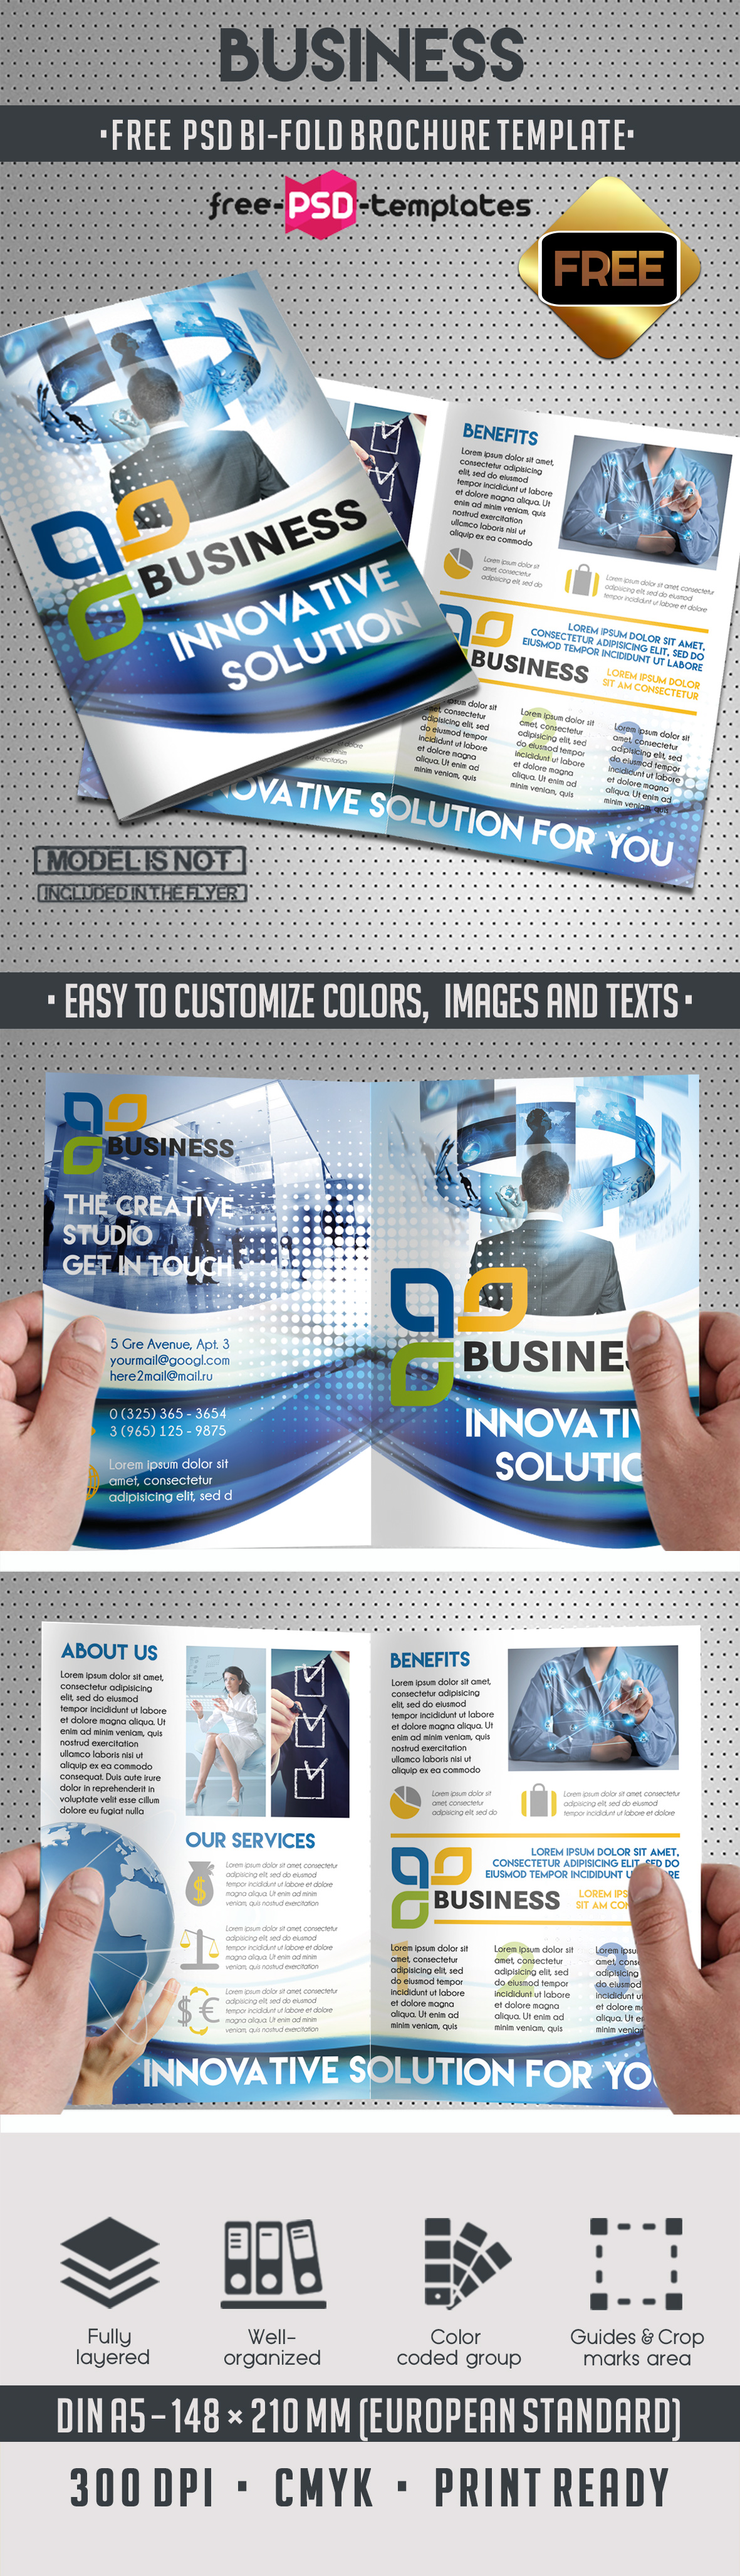 Free Corporate Business PSD Bi-Fold Brochure | Free-PSD ...